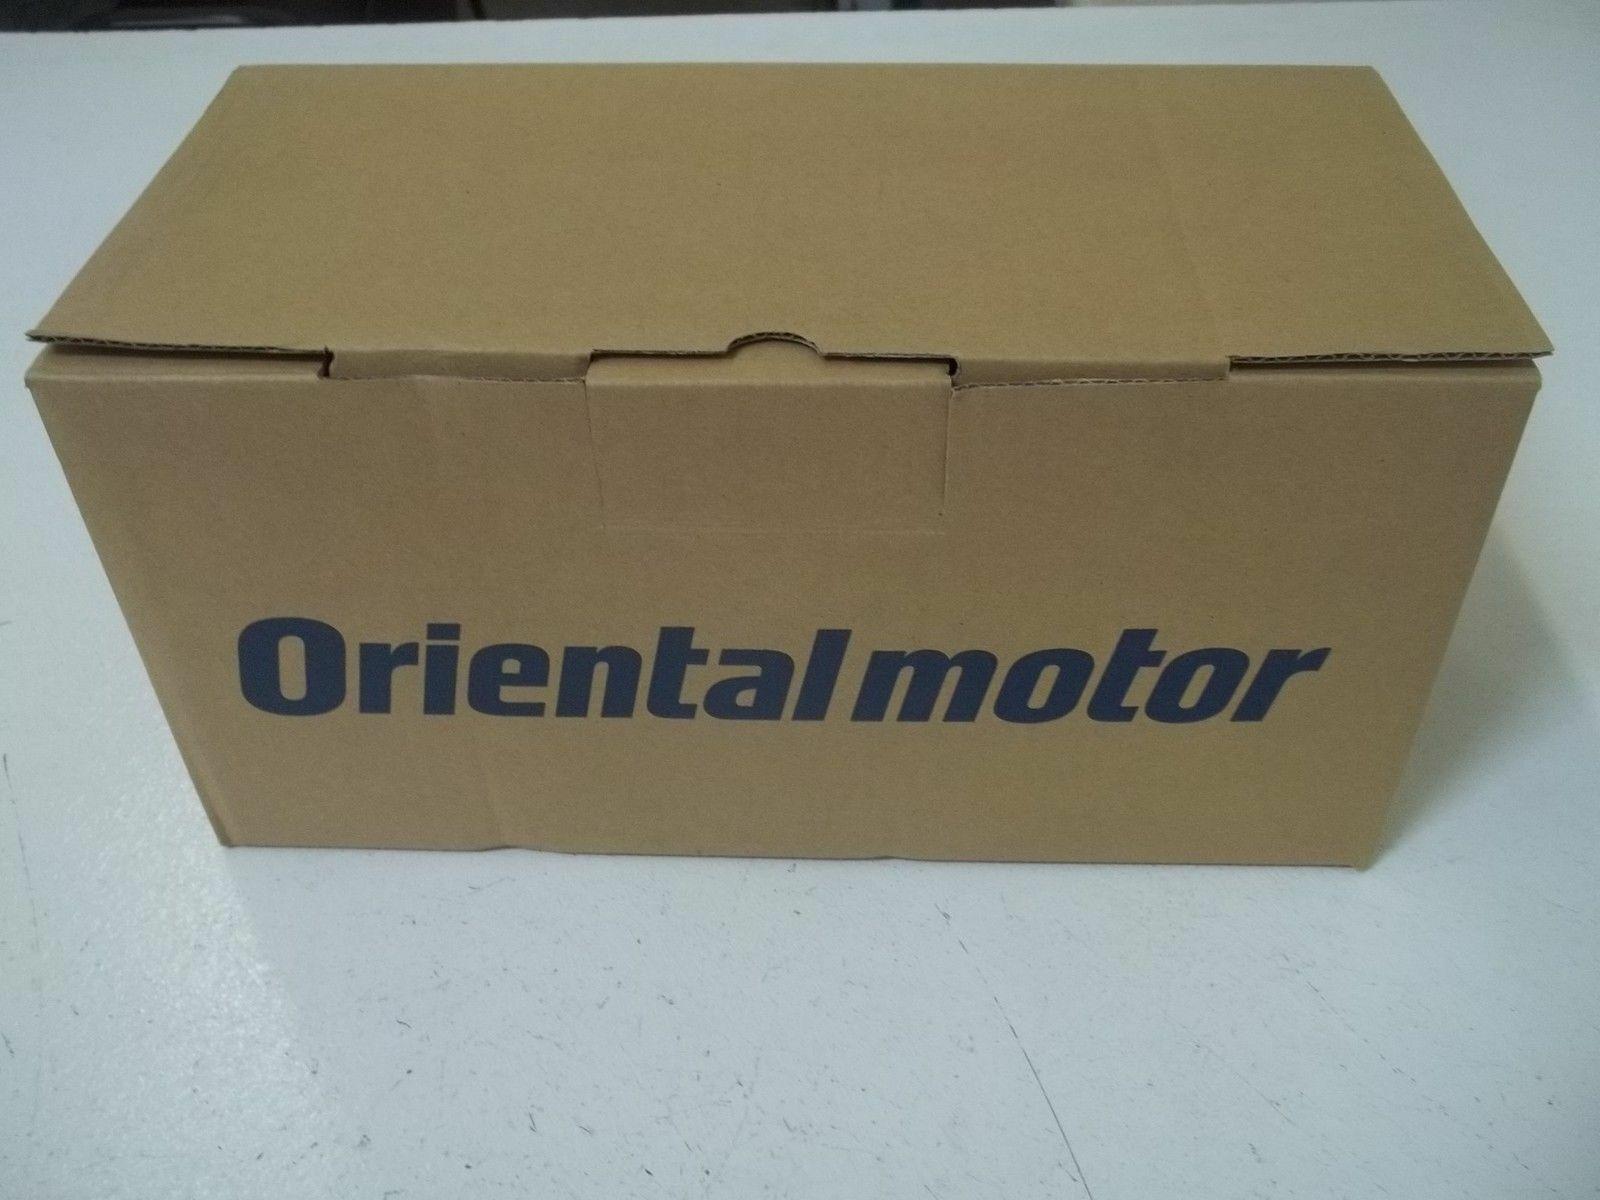 ORIENTAL MOTOR FPW425A2-7.5U WATER TIGHT MOTOR NEW IN BOX